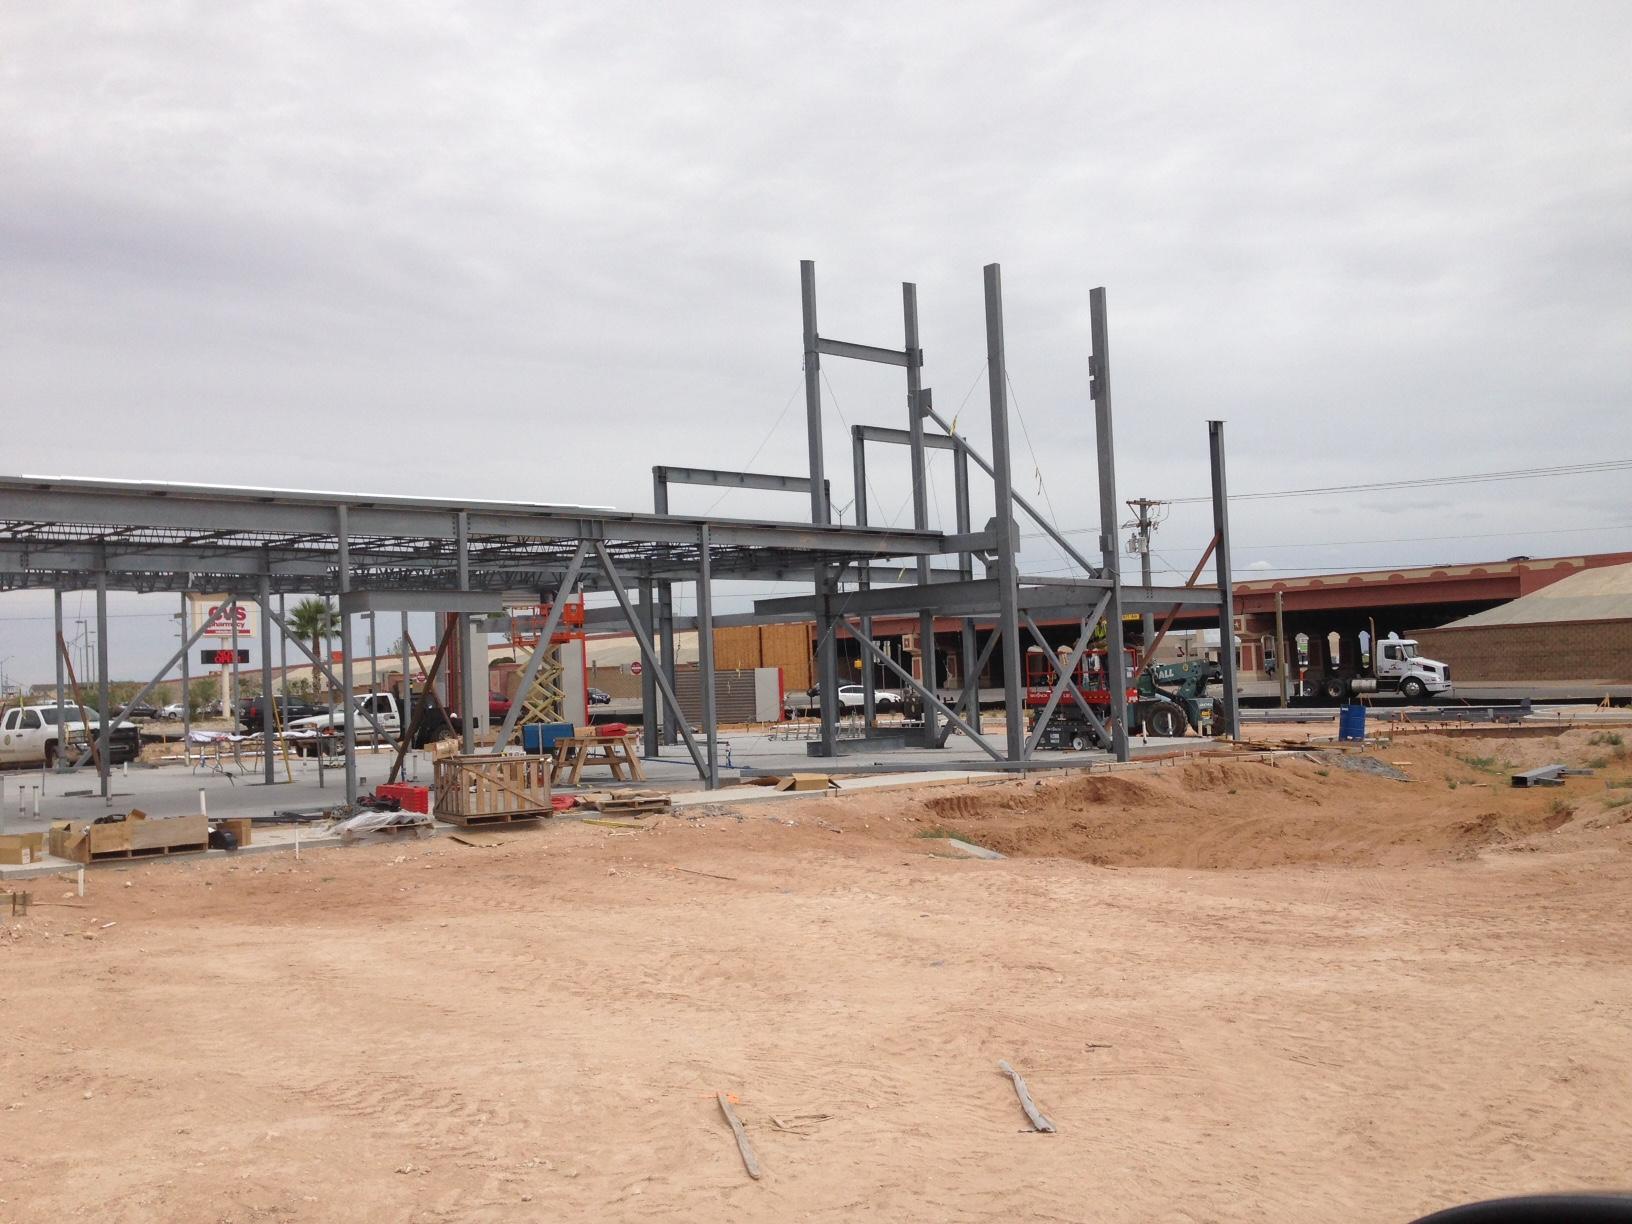 Sun city emergency room el paso highland enterprises inc for New construction el paso tx